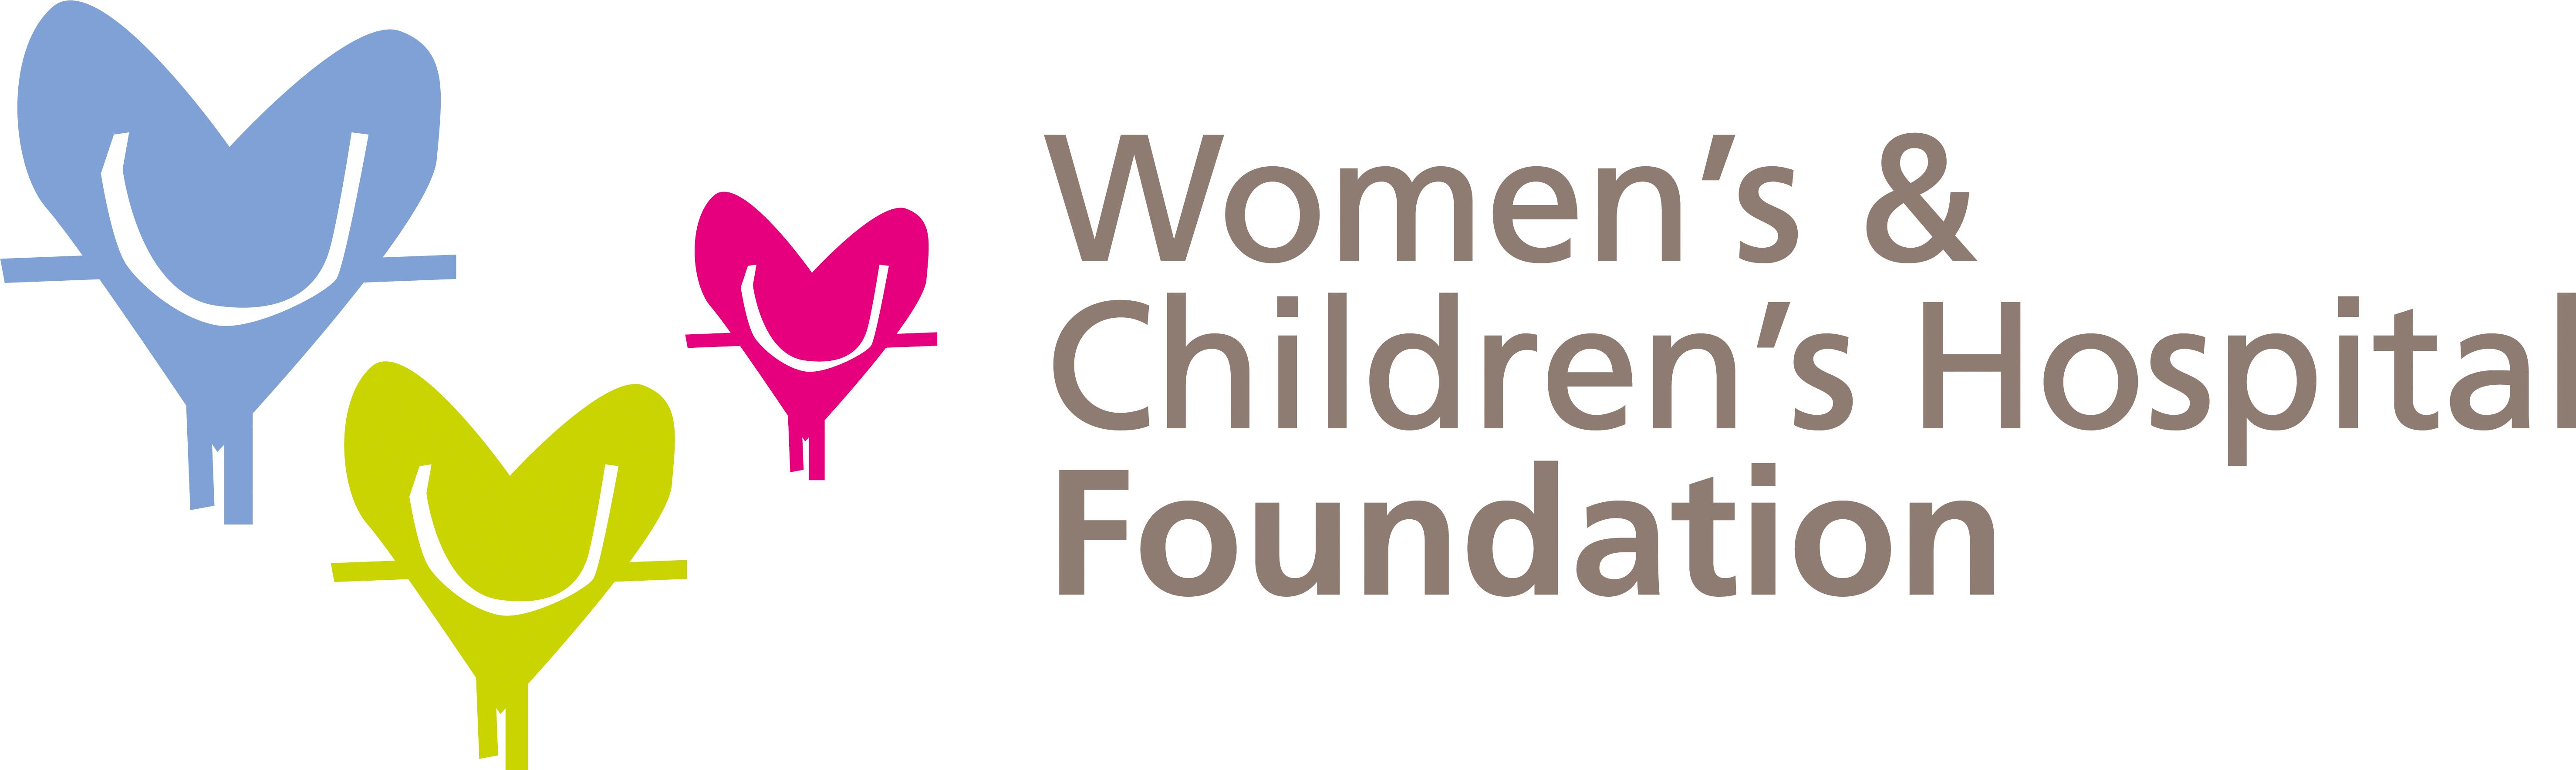 childrens hospital foundation caden - 1024×306